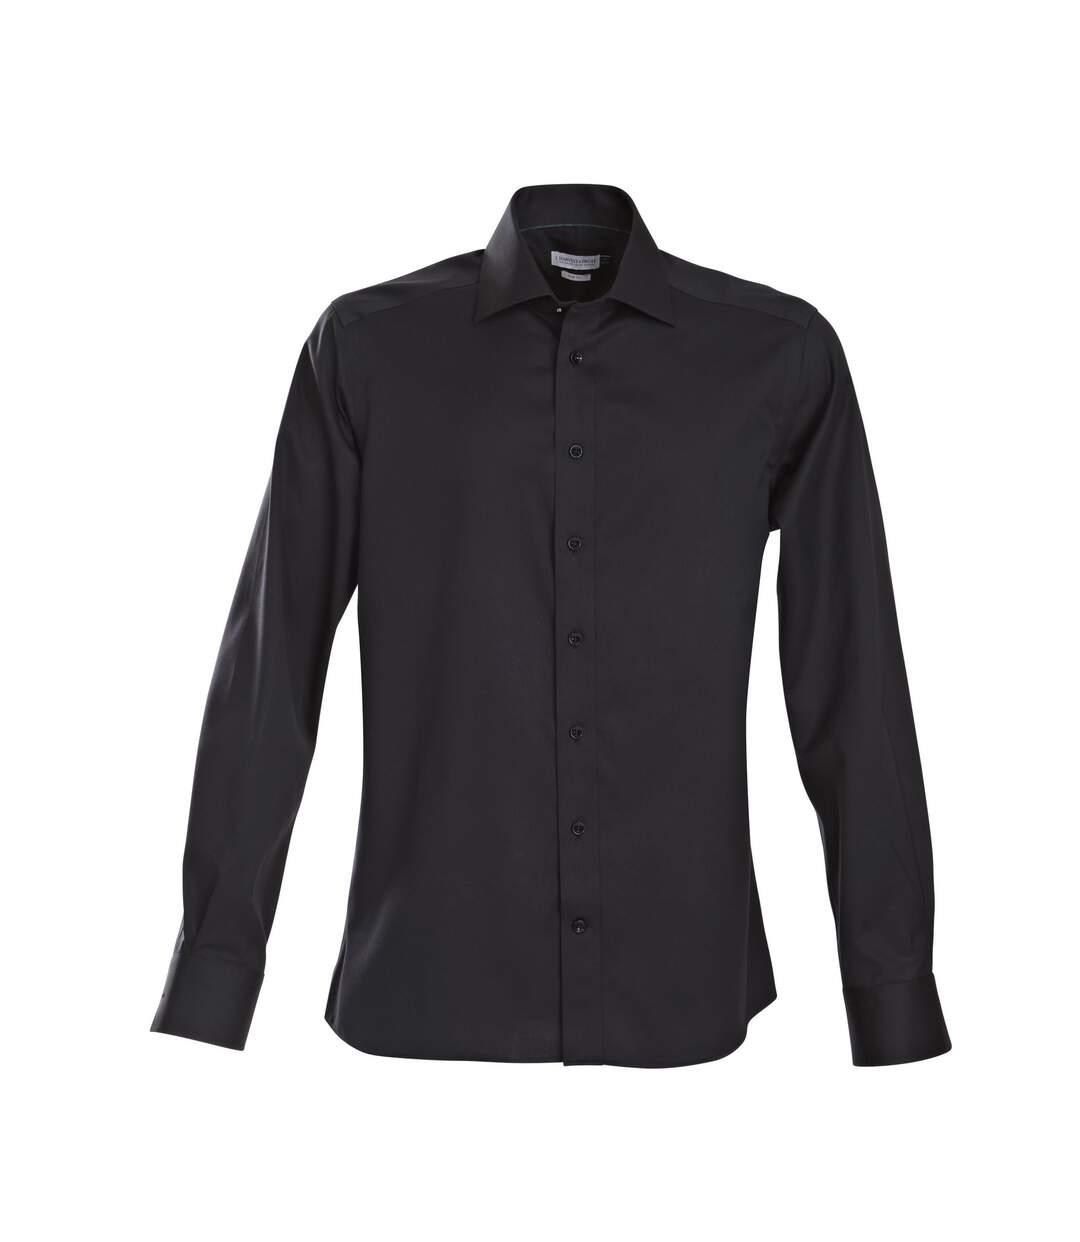 J Harvest & Frost Mens Green Bow Collection Slim Fit Formal Shirt (Black) - UTRW3866